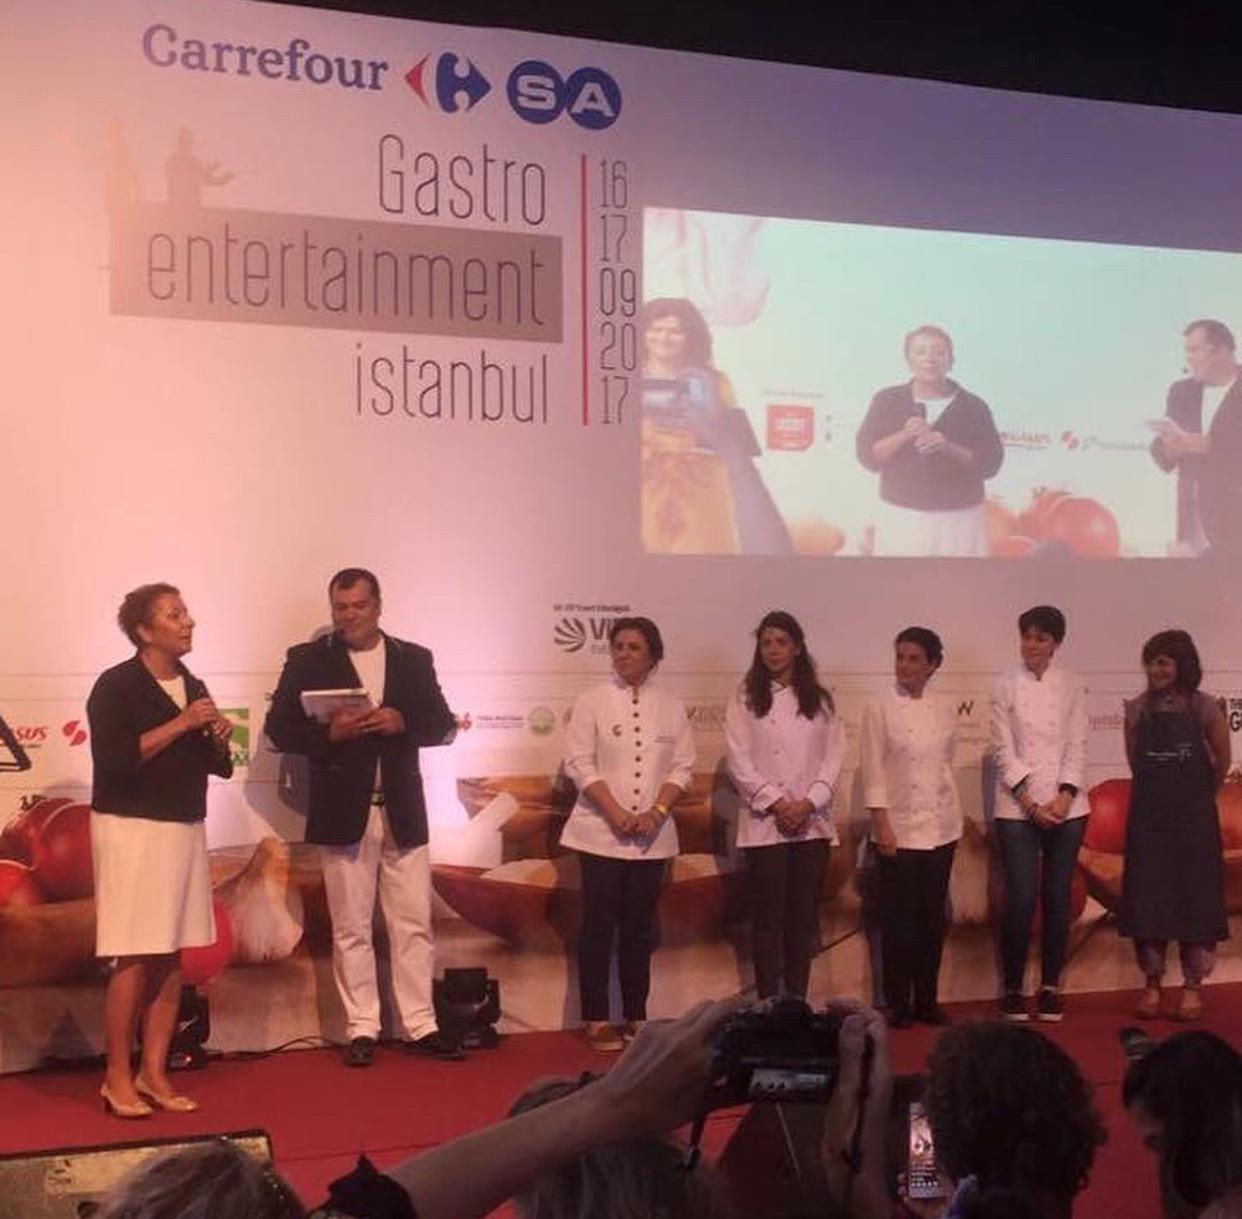 CarrefourSA Gastro Entertainment İstanbul etkinliği